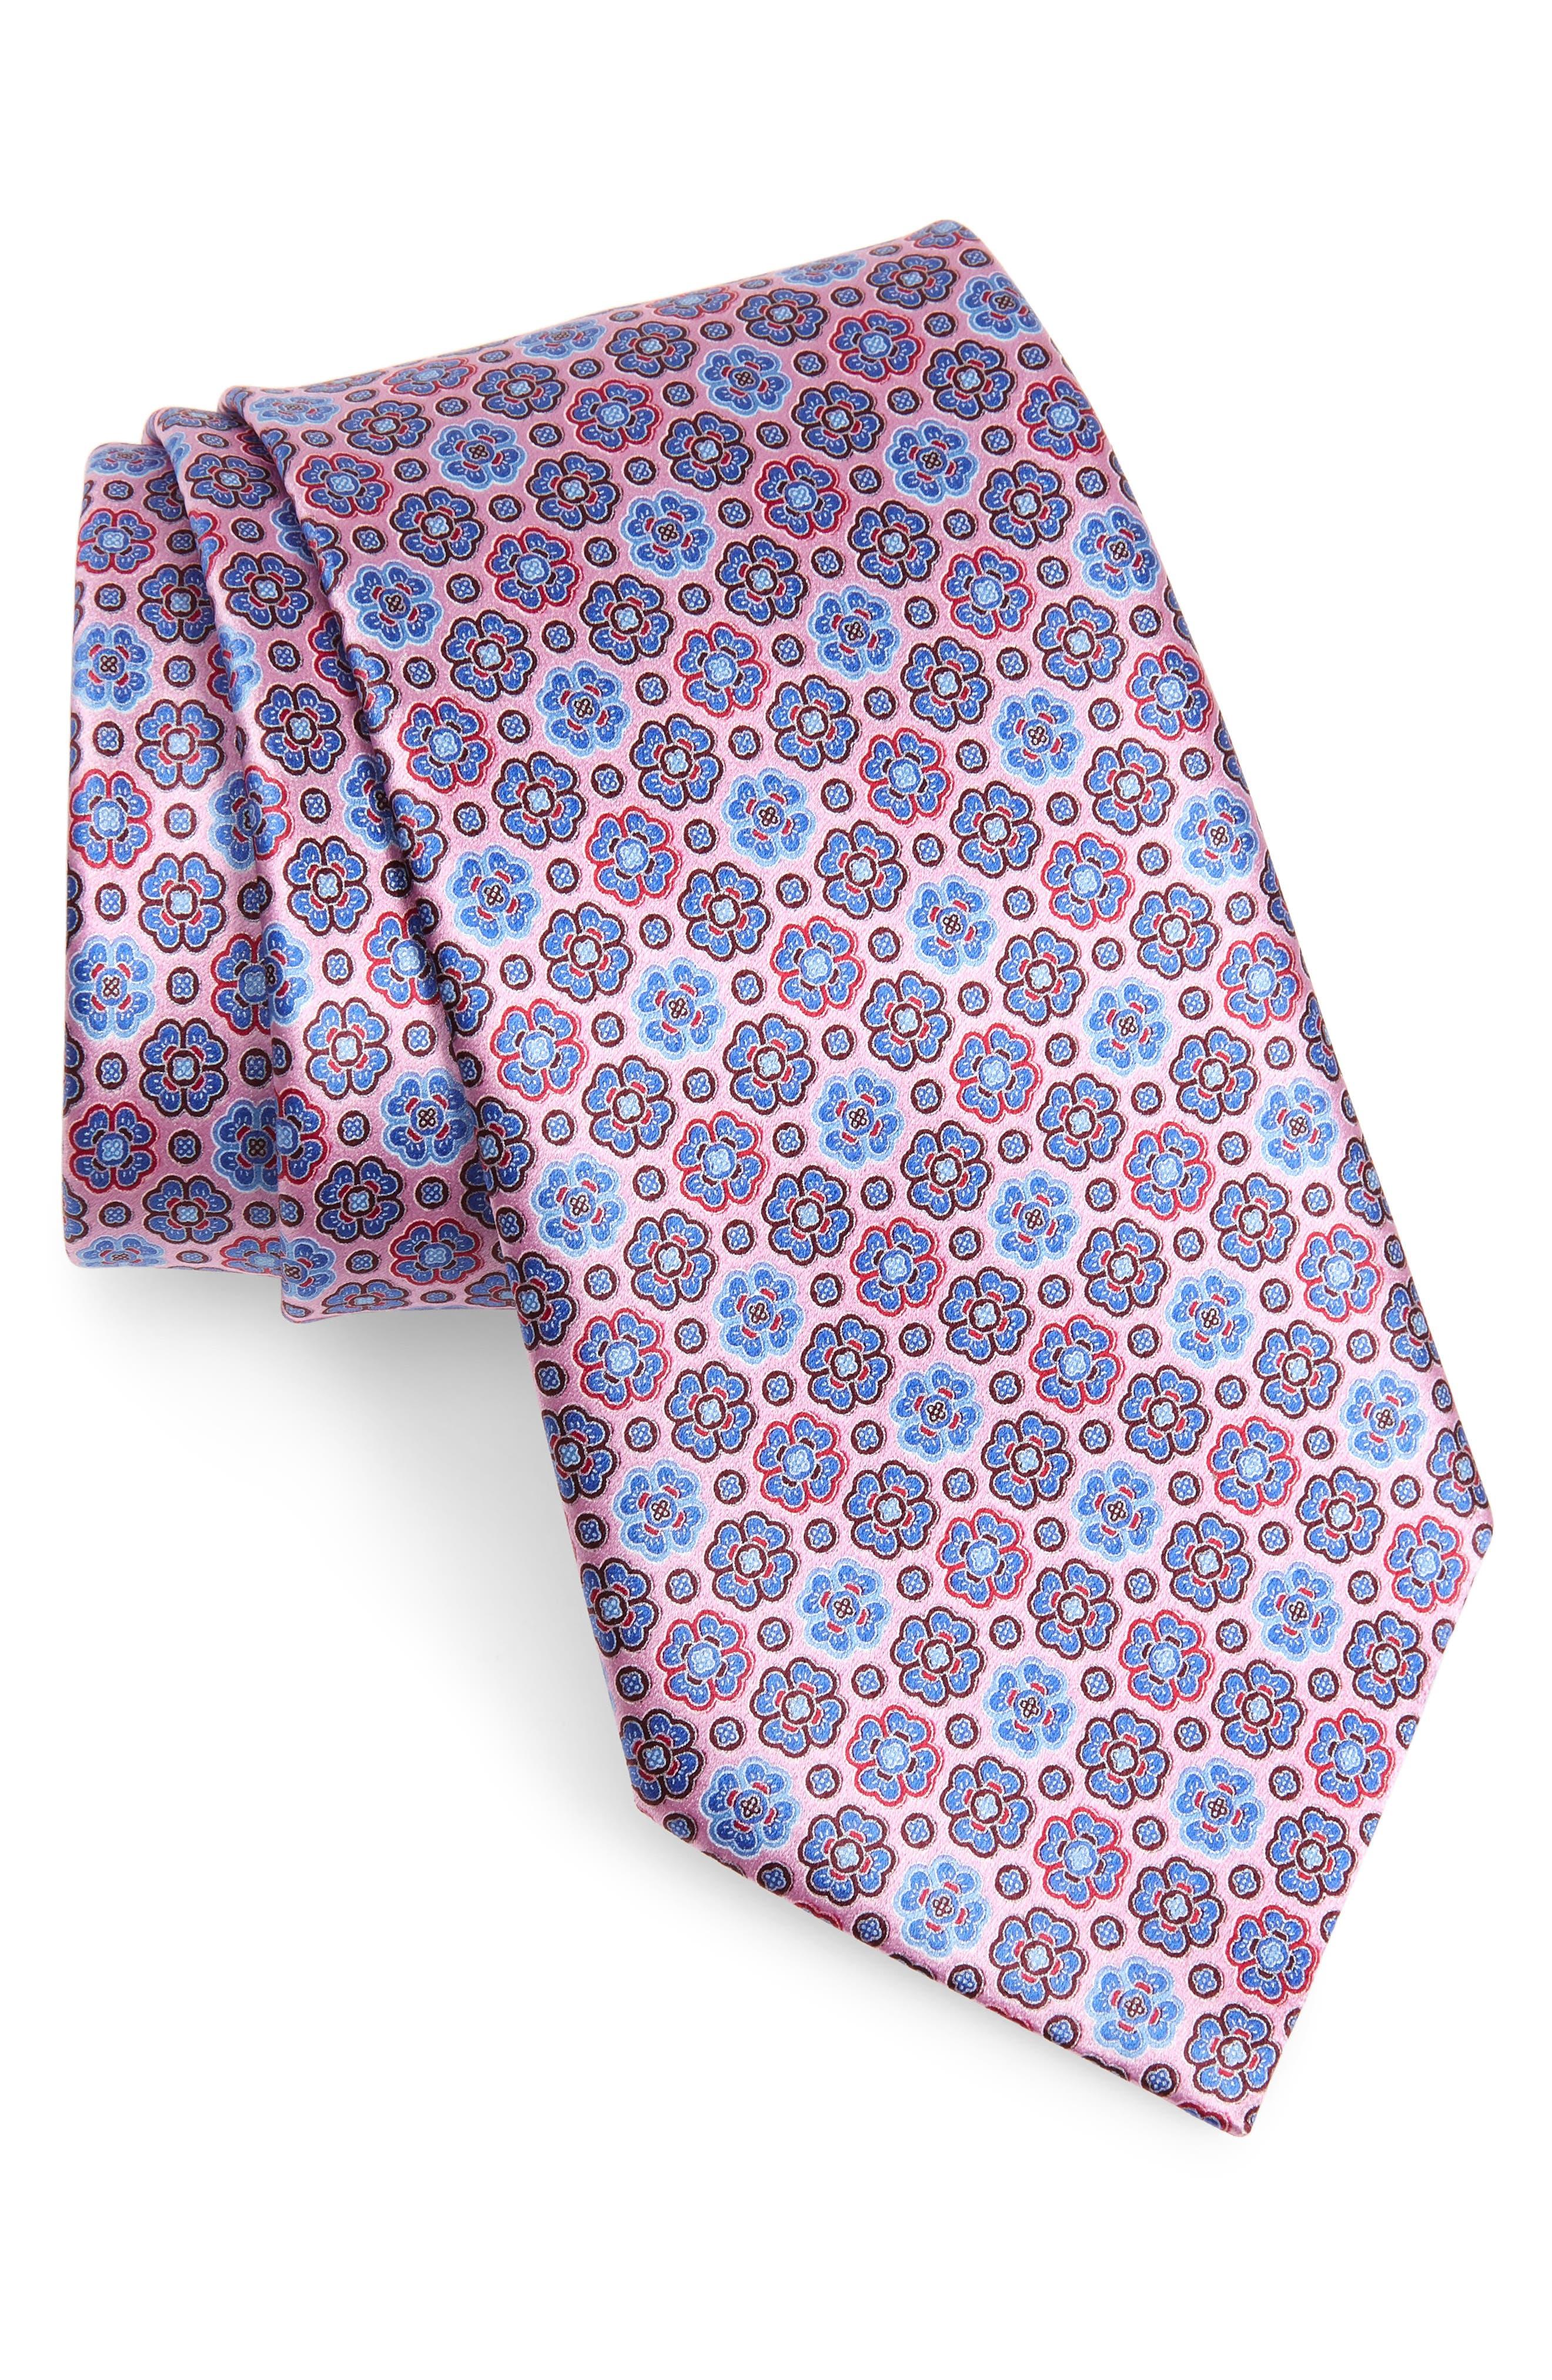 ERMENEGILDO ZEGNA Micro Floral Silk Tie, Main, color, PINK